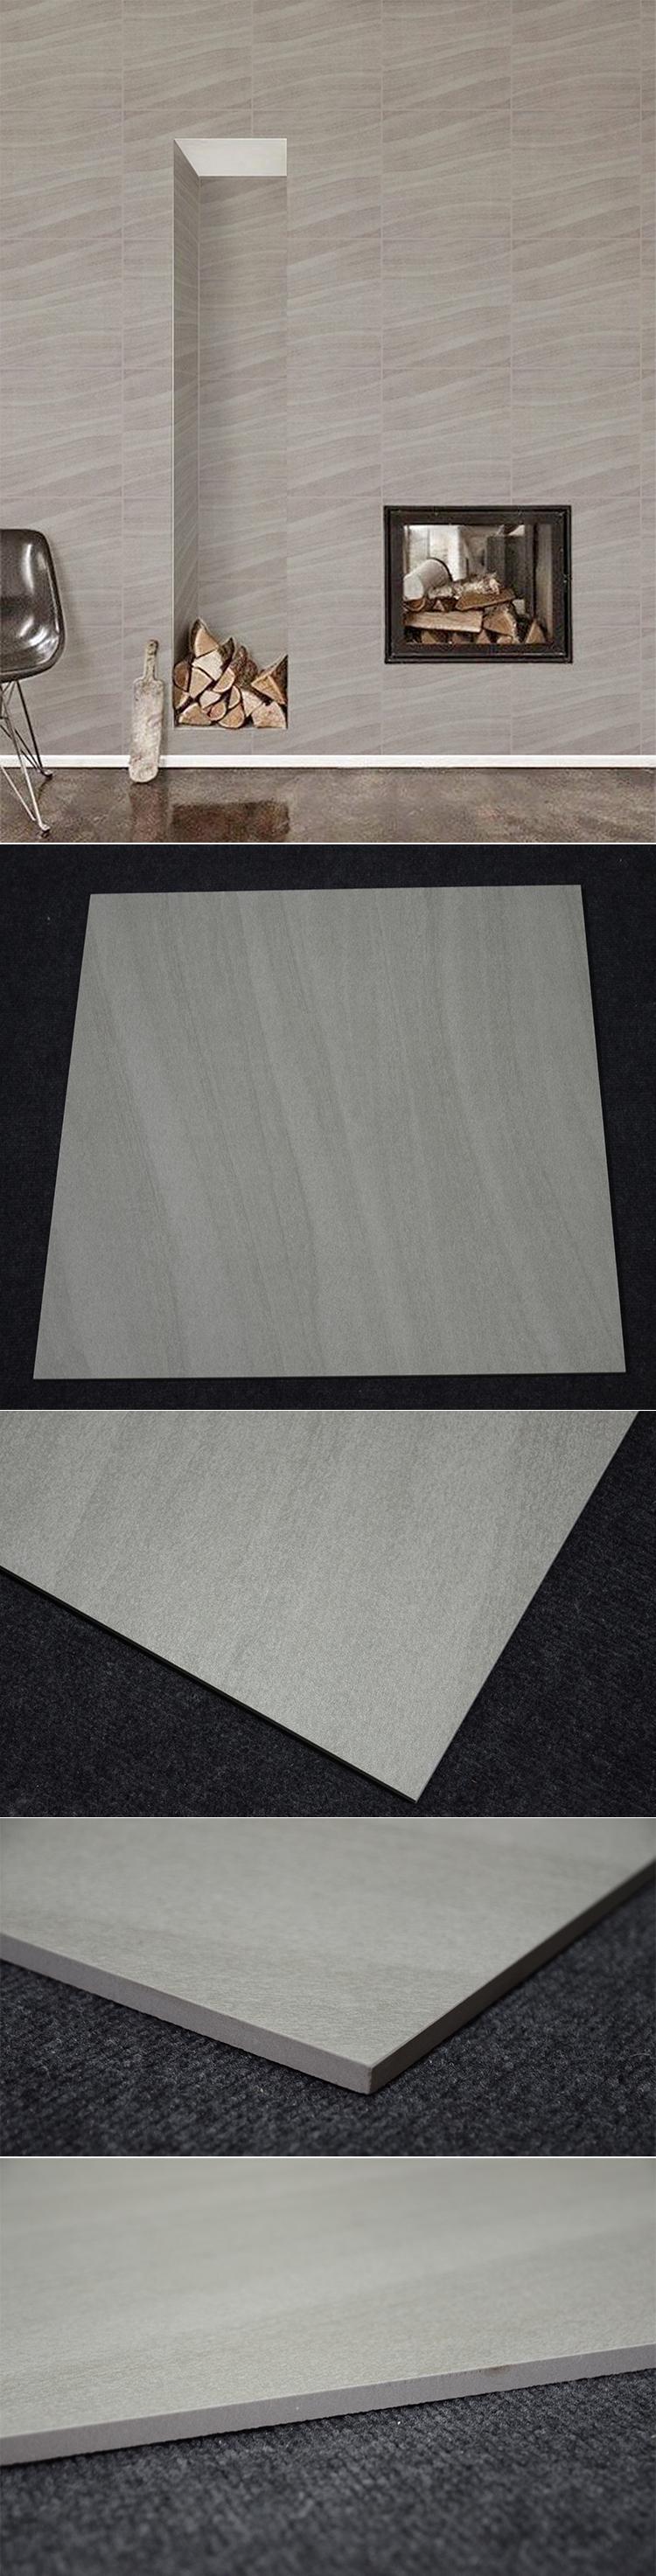 Hhl6302 ceramic tile thicknessheavy duty ceramic tileceramic hhl6302 ceramic tile thicknessheavy duty ceramic tileceramic tile 600x600 doublecrazyfo Choice Image